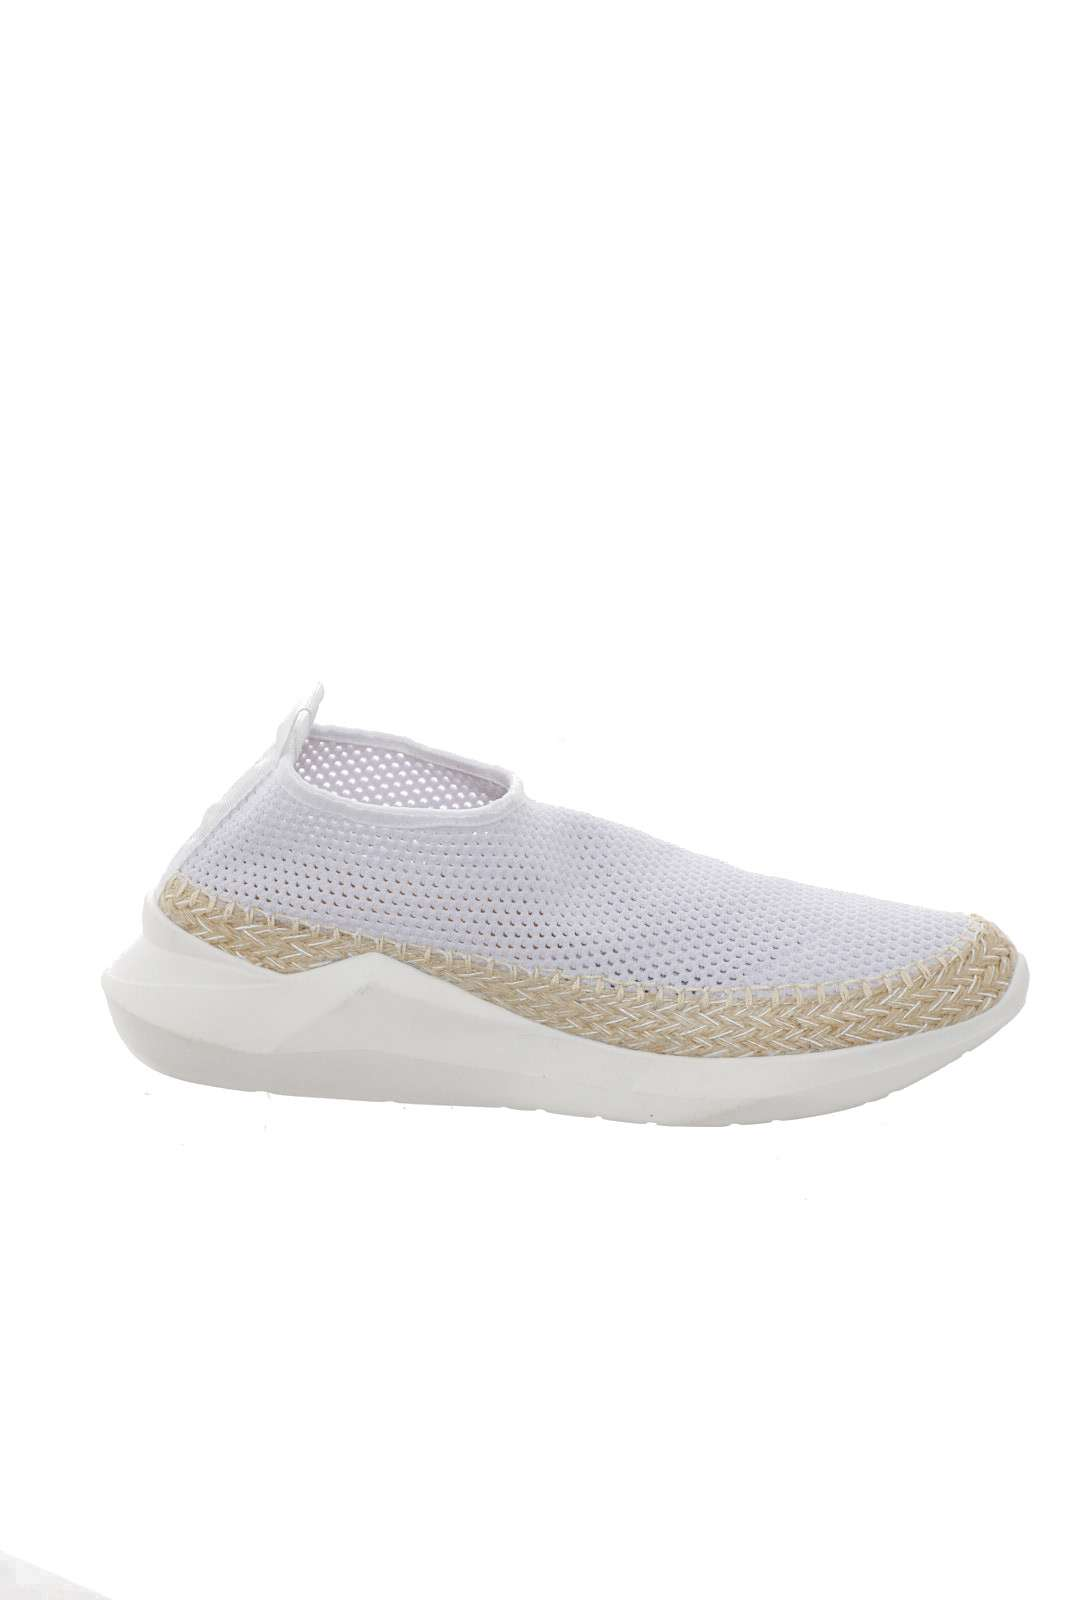 /media/catalog/product/a/i/PE-outlet_parmax-scarpe-donna-PF16-117-A.jpg